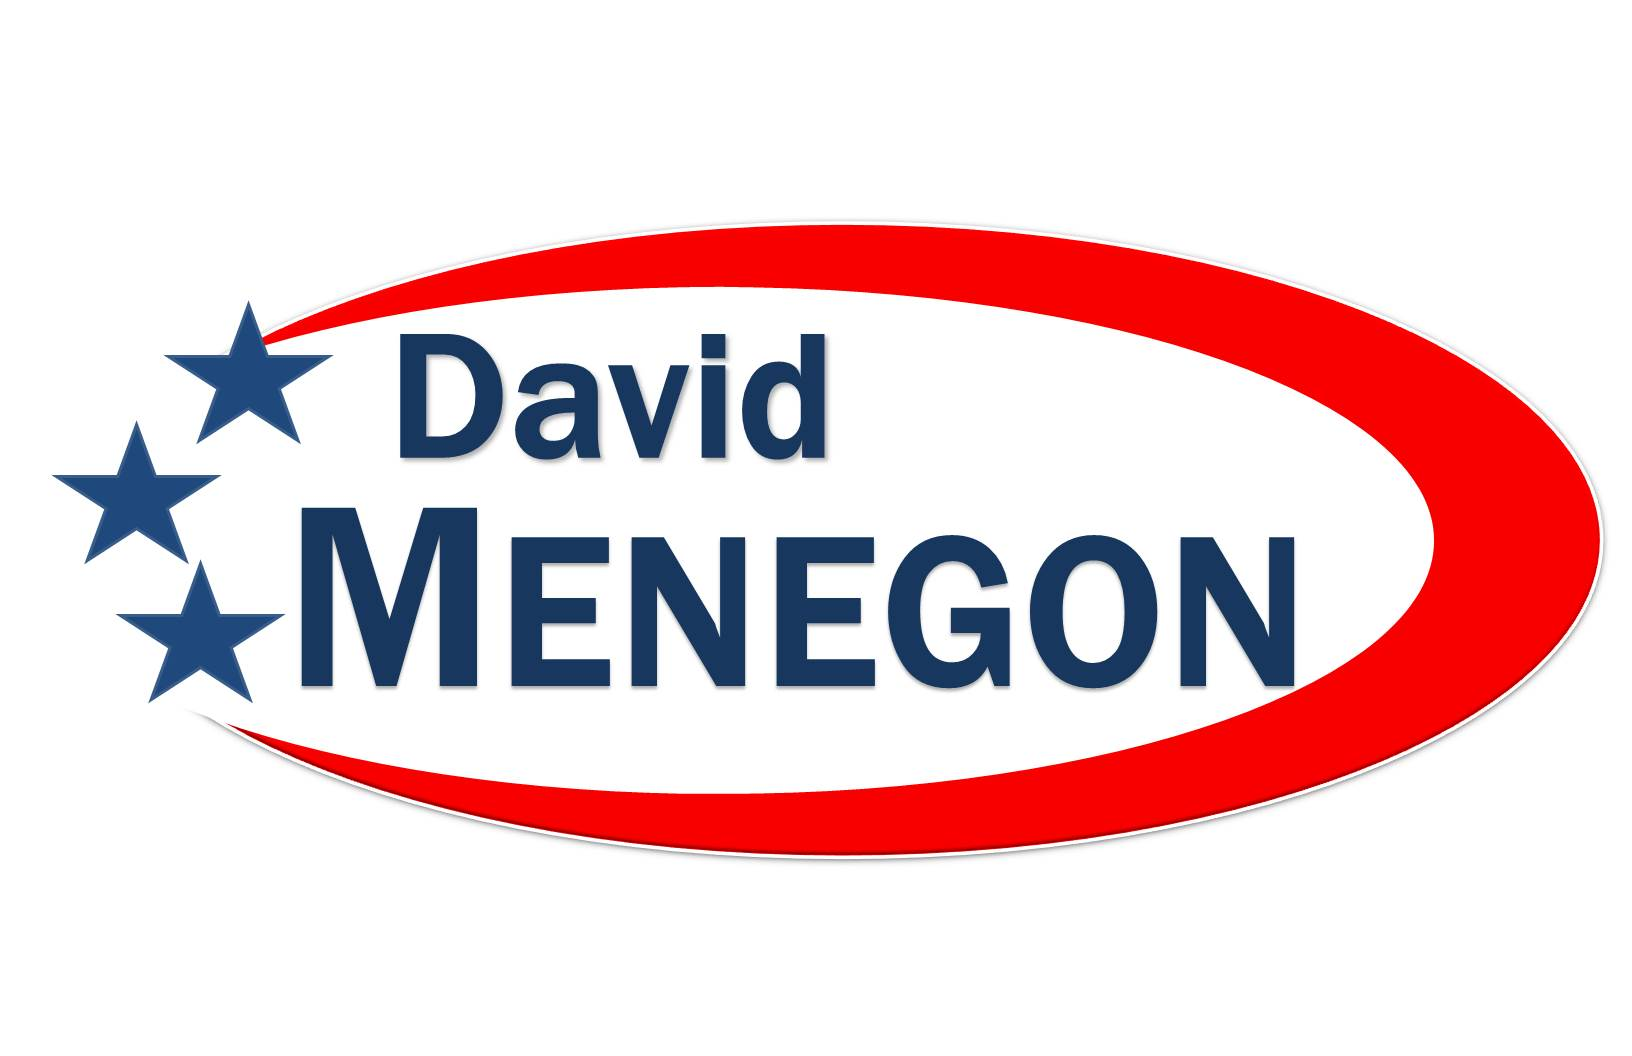 David Menegon